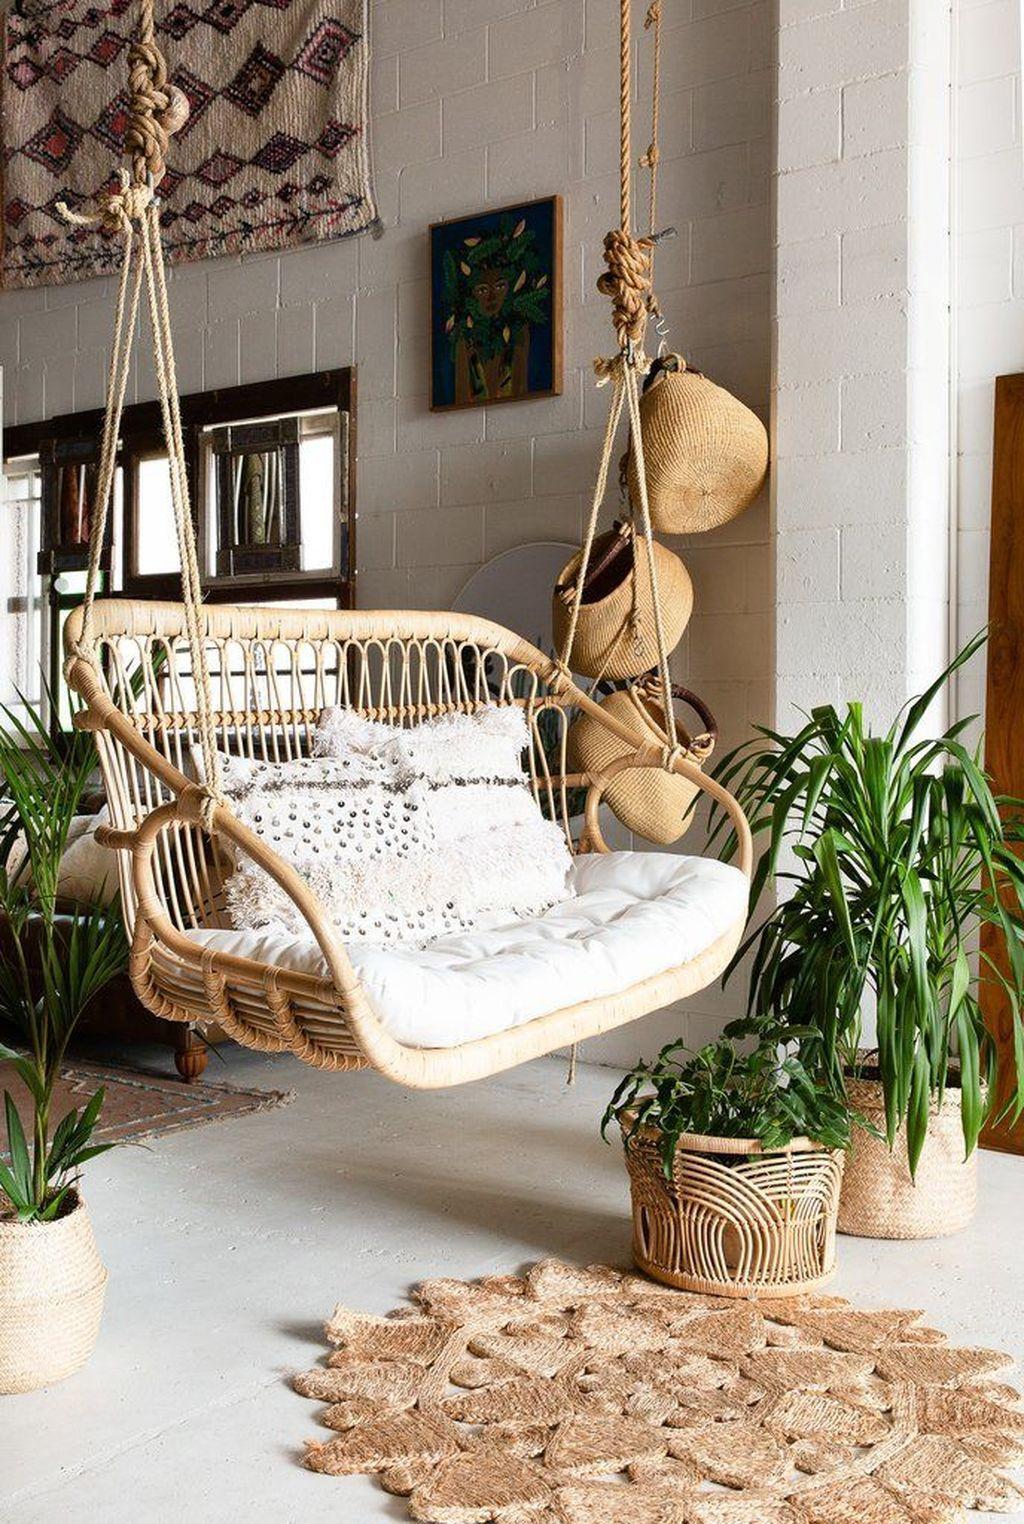 48 Stylish Rattan Furniture Design Ideas Trendehouse Hanging Chair Home Decor Rattan Furniture